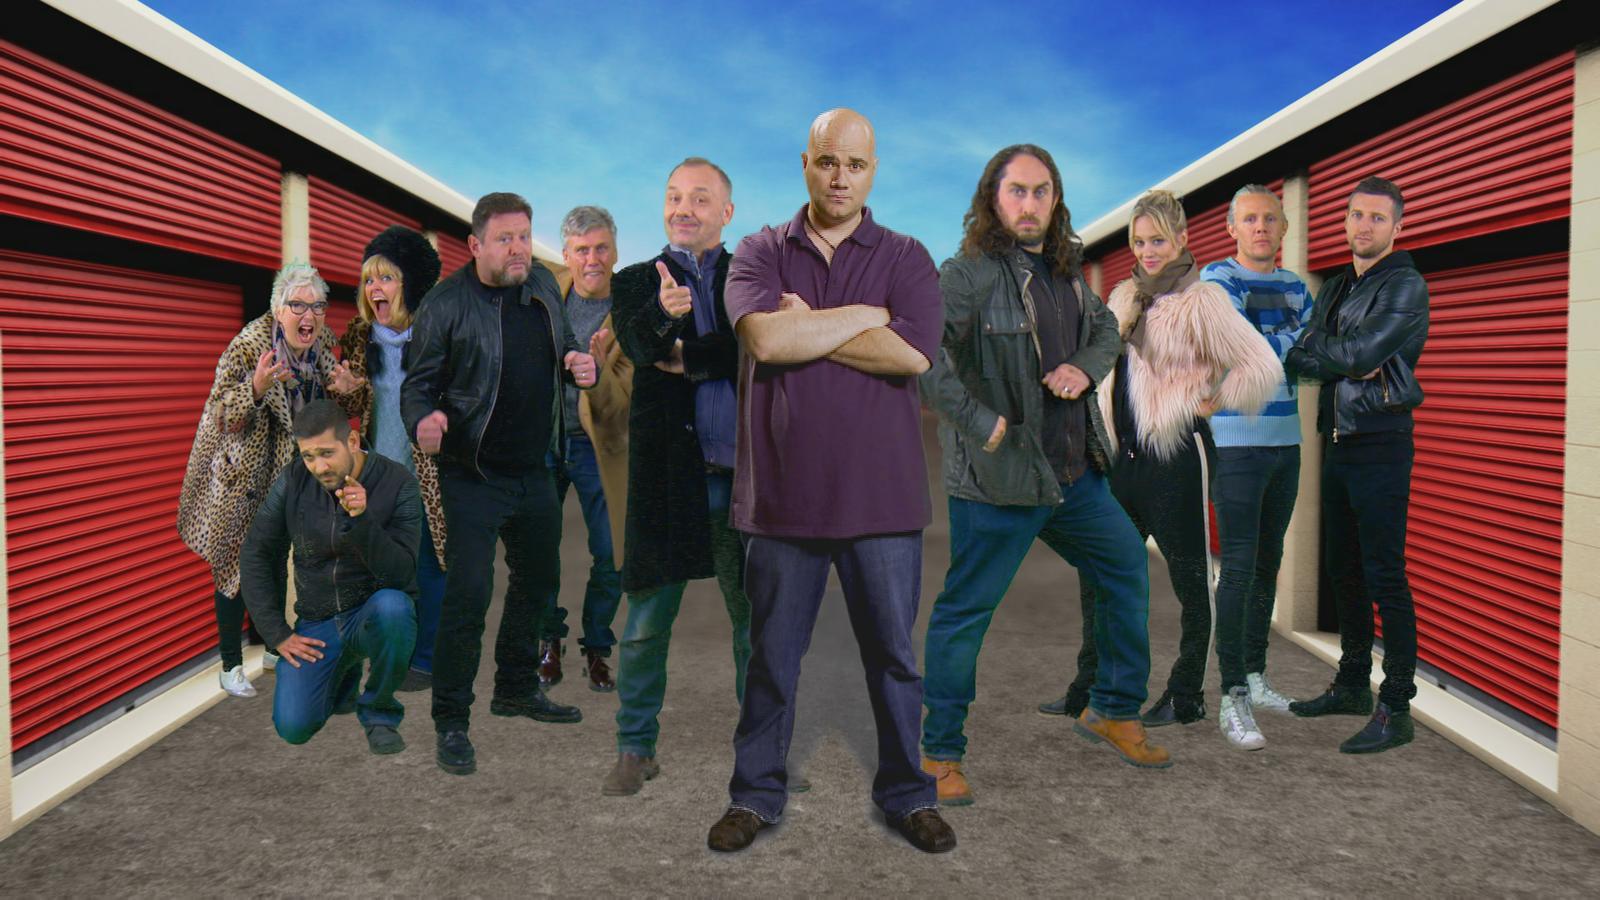 Dave Bids On Storage Hunters Uk Celebrity Special News Uktv